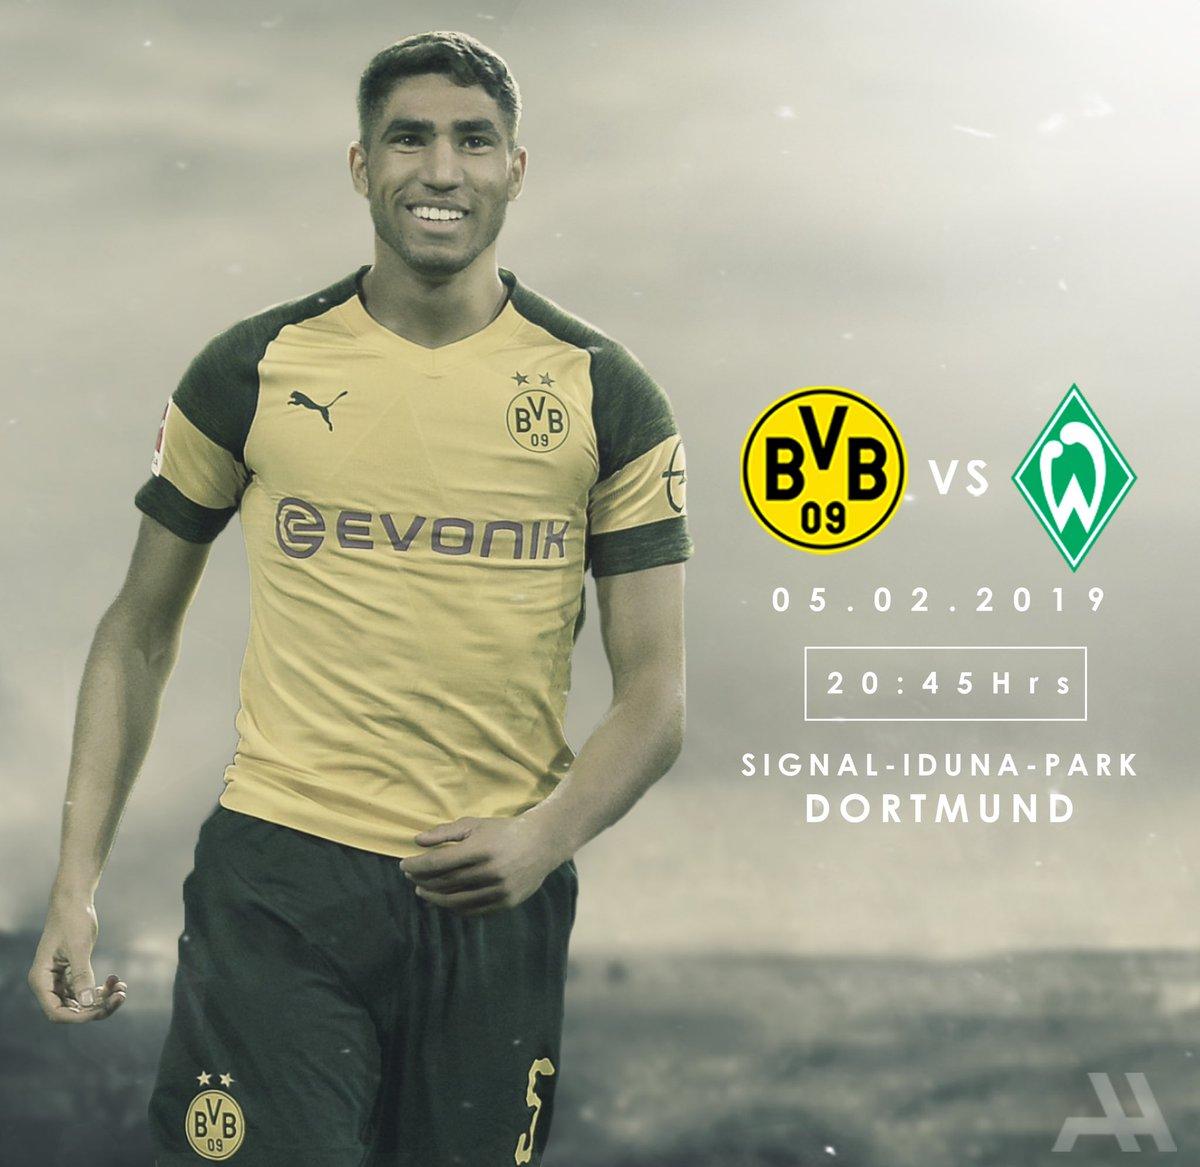 🏆 DFB Pokal 🆚 Werder Bremen 🏟 Signal Iduna Park 🗓️ Tuesday, February 5th ⏰ 20:45 ⚽️🐝 #BVBSVW